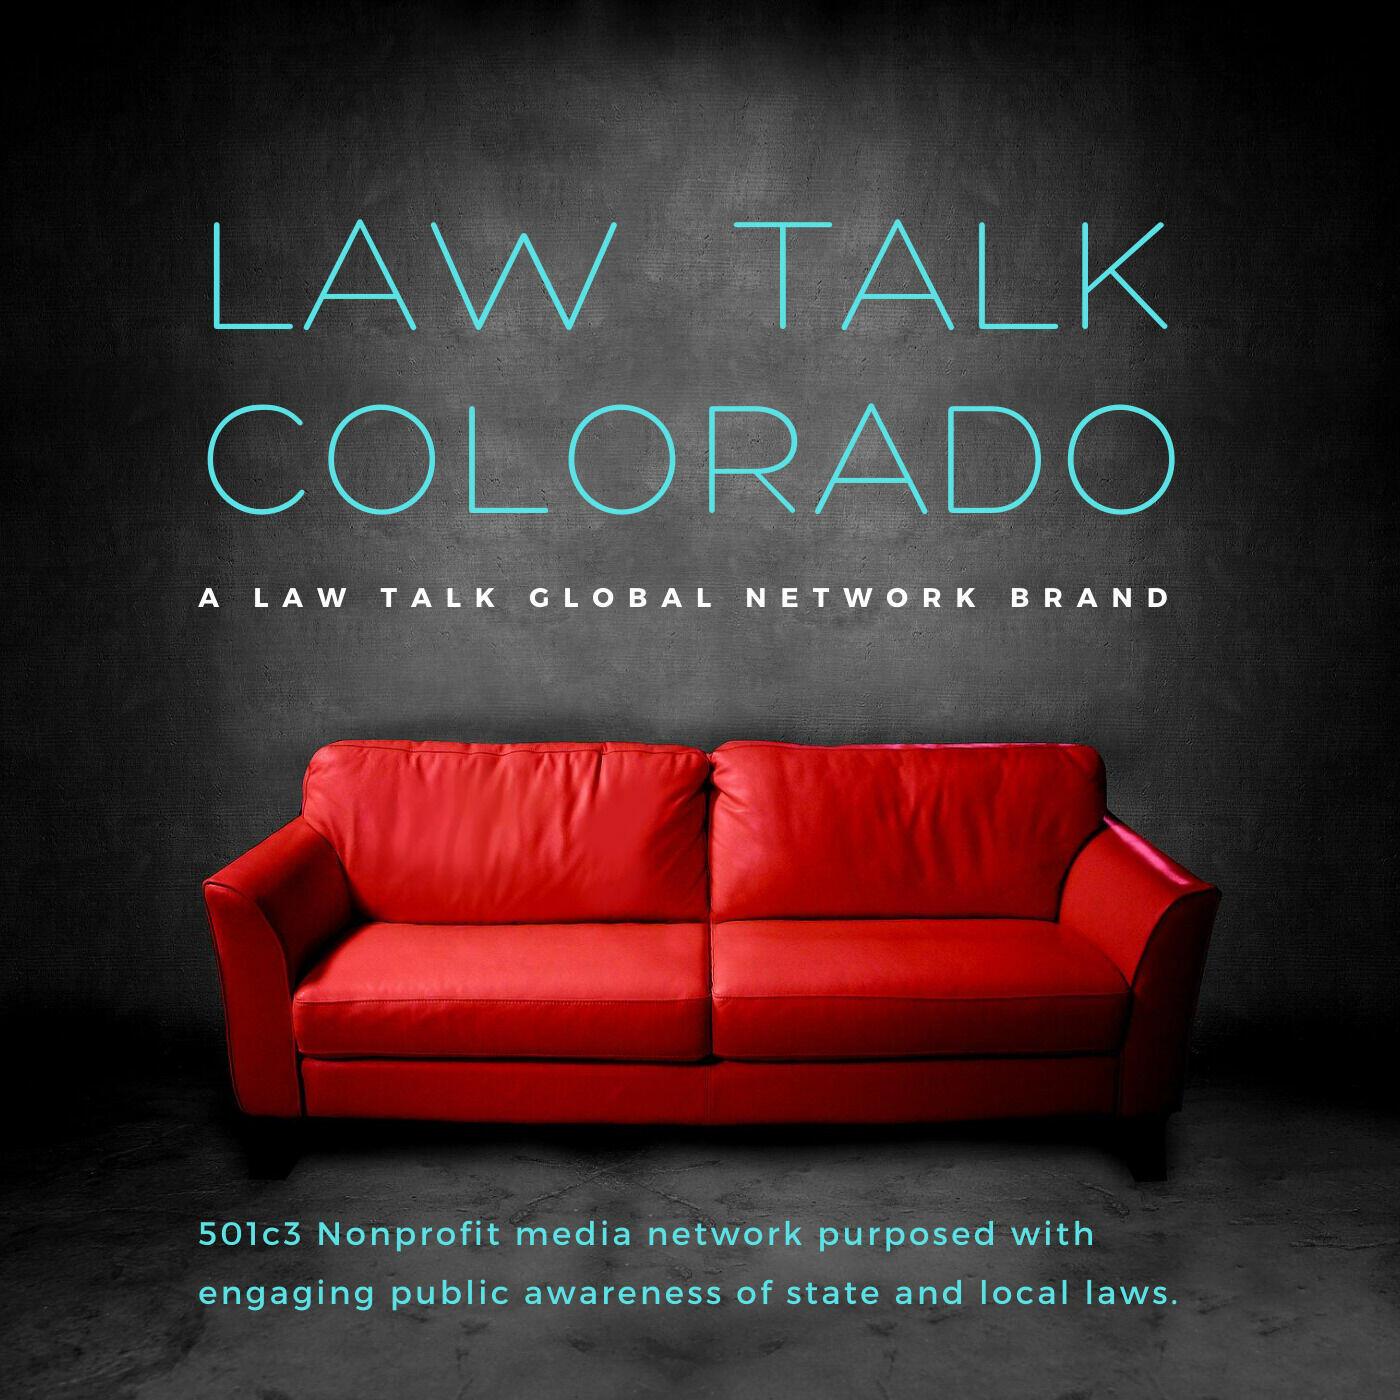 Law Talk Colorado, a Law Talk Global Network brand